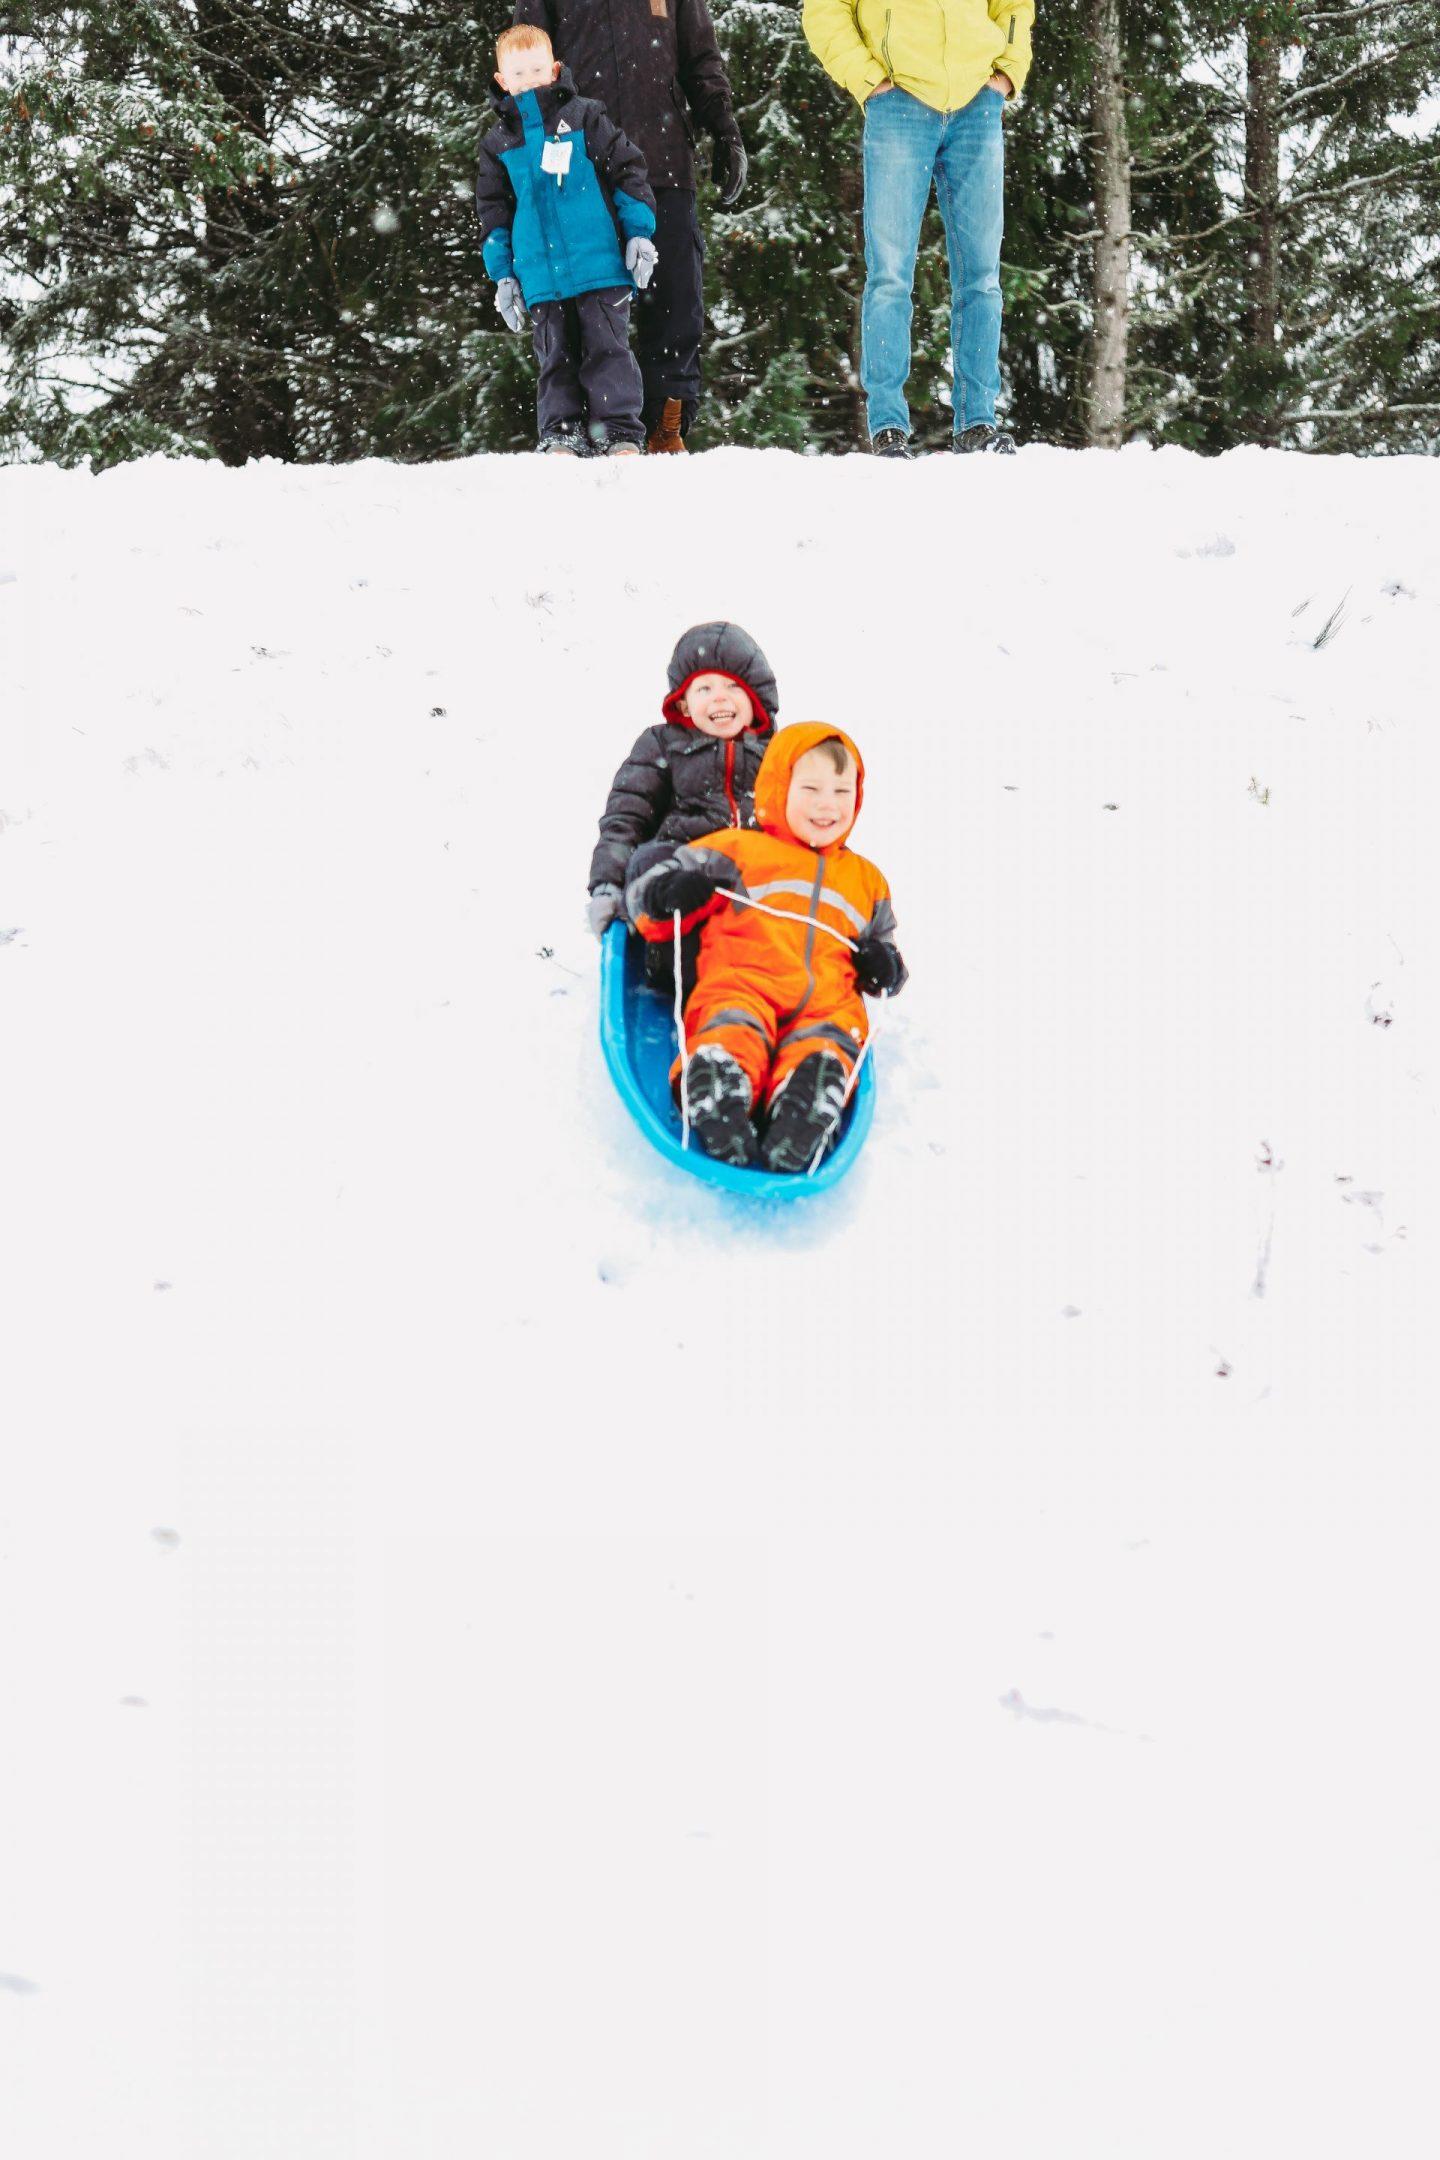 sledding at jblm